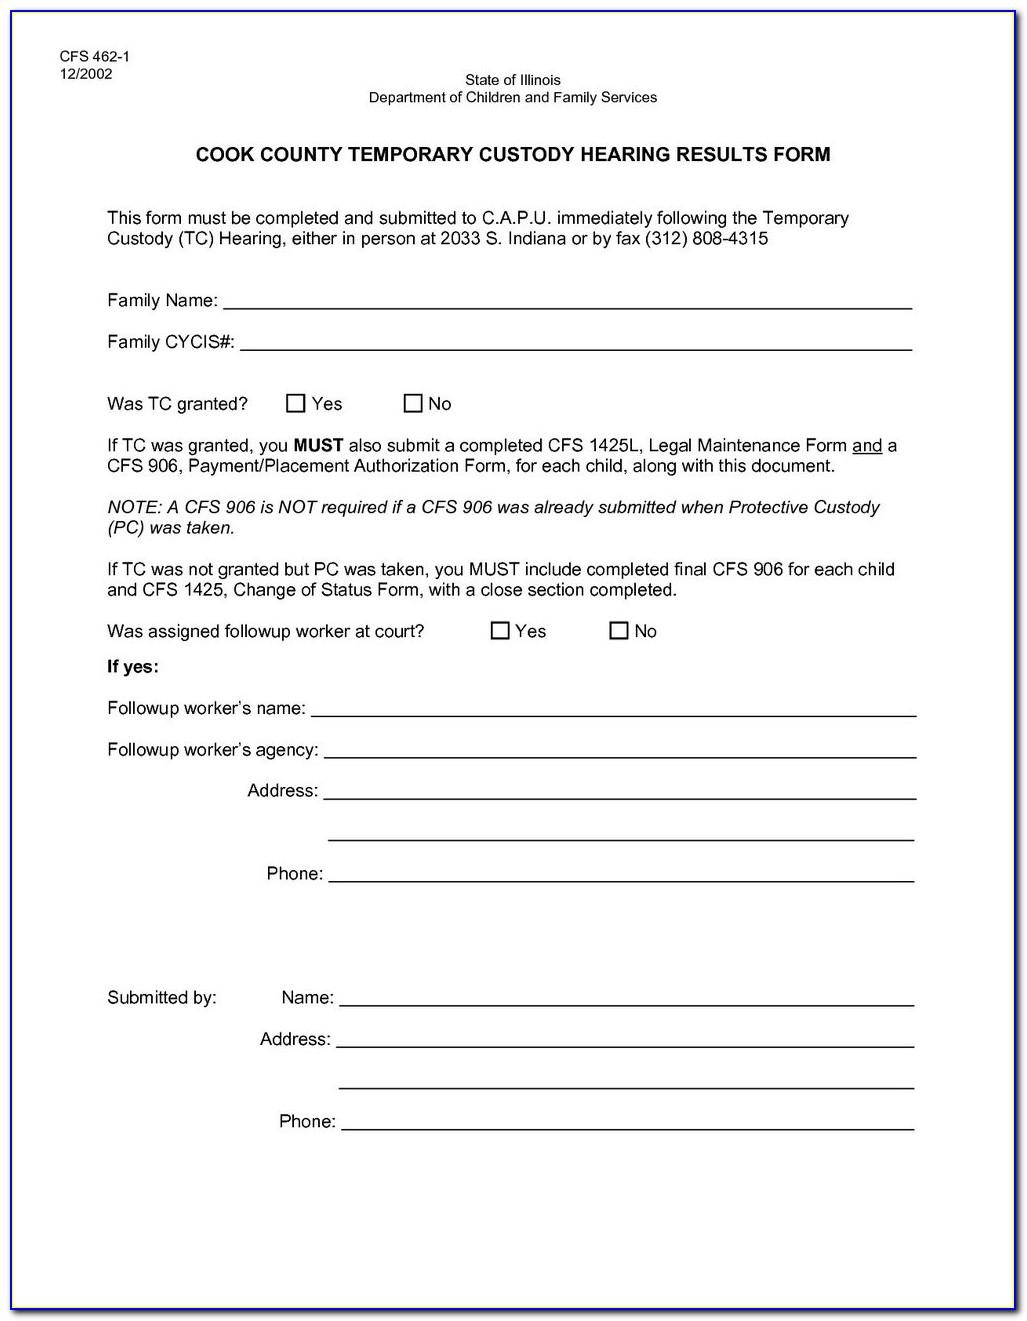 Arizona Legal Custody Forms